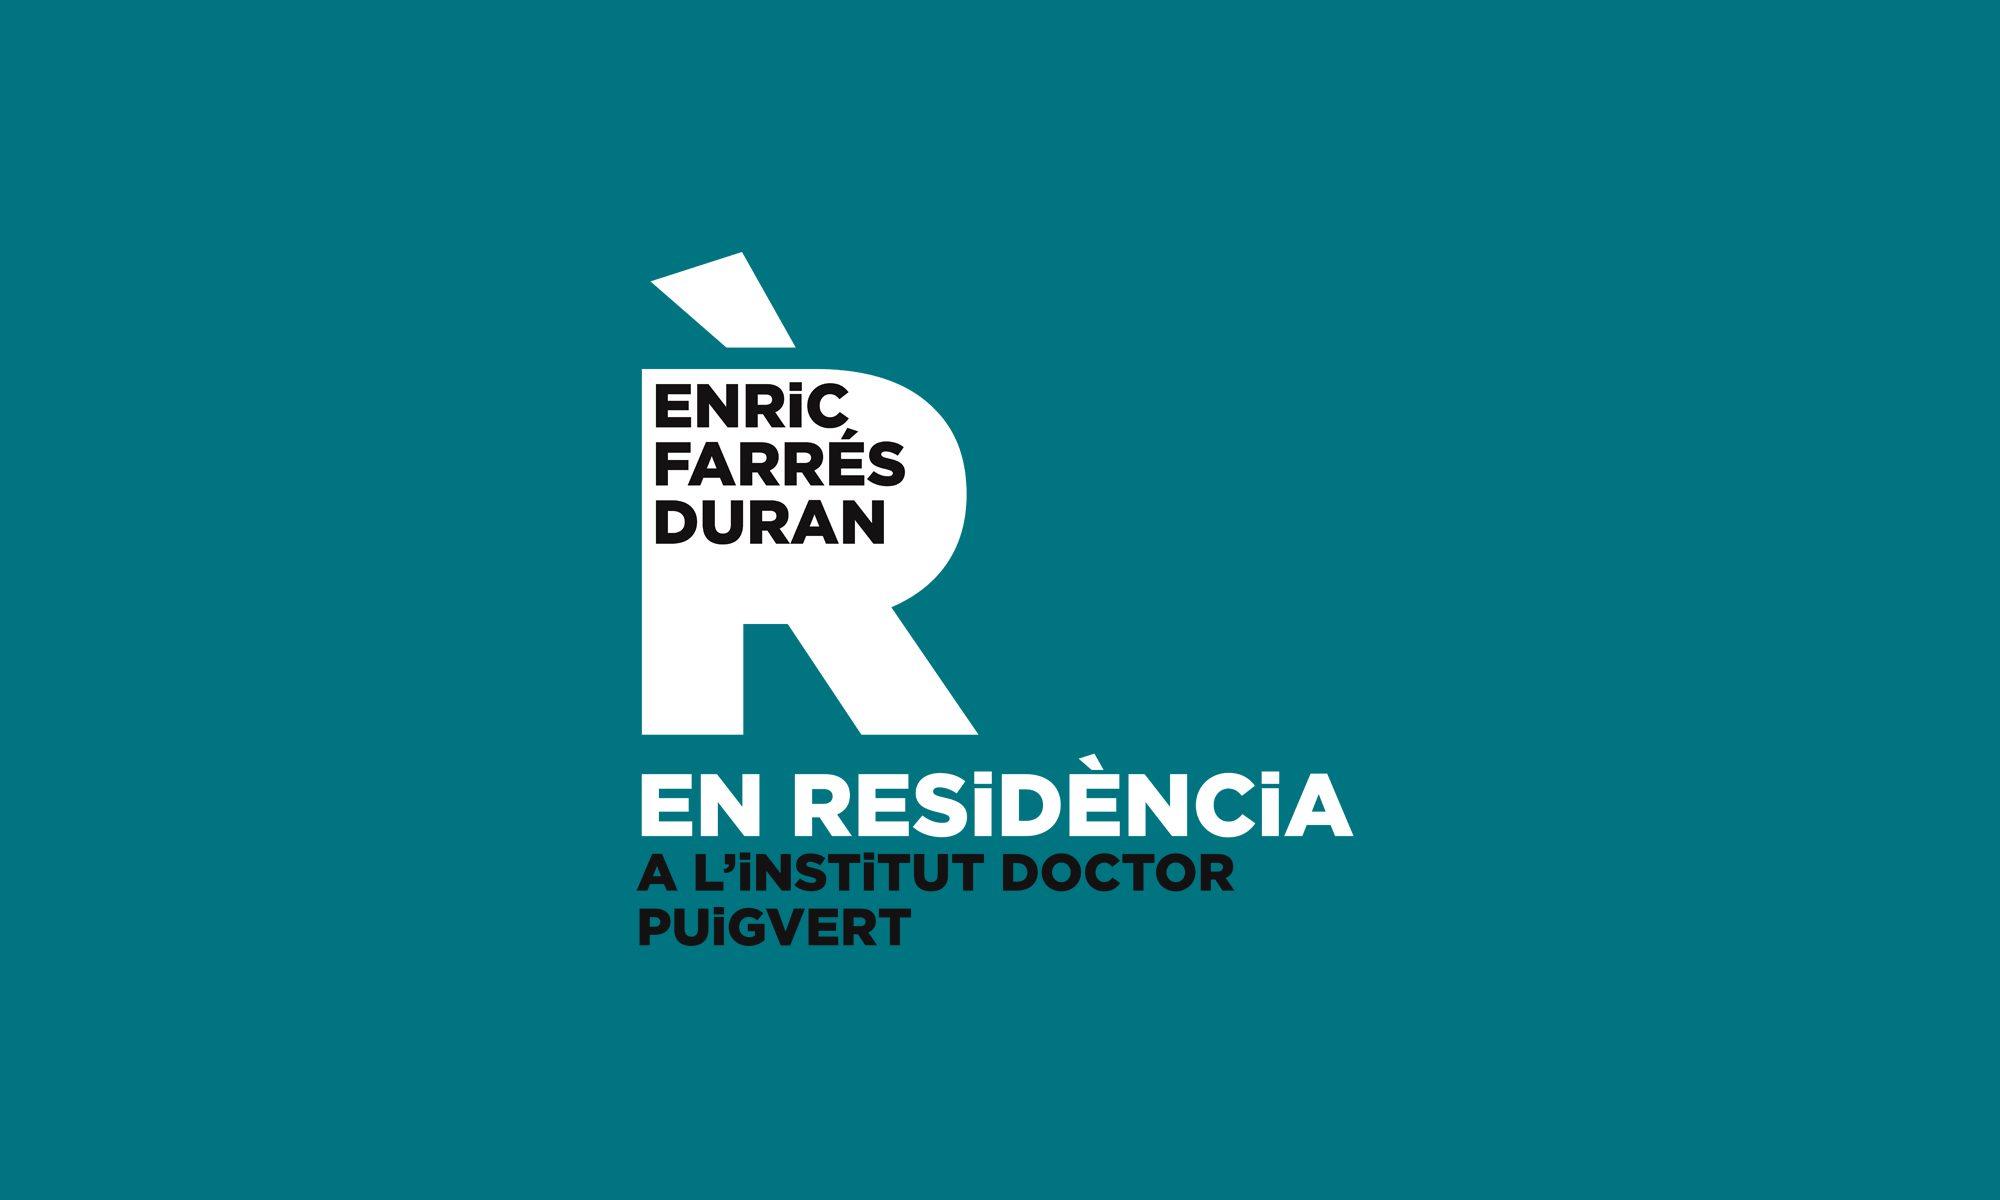 Enric Farrés Duran EN RESiDÈNCiA al Doctor Puigvert